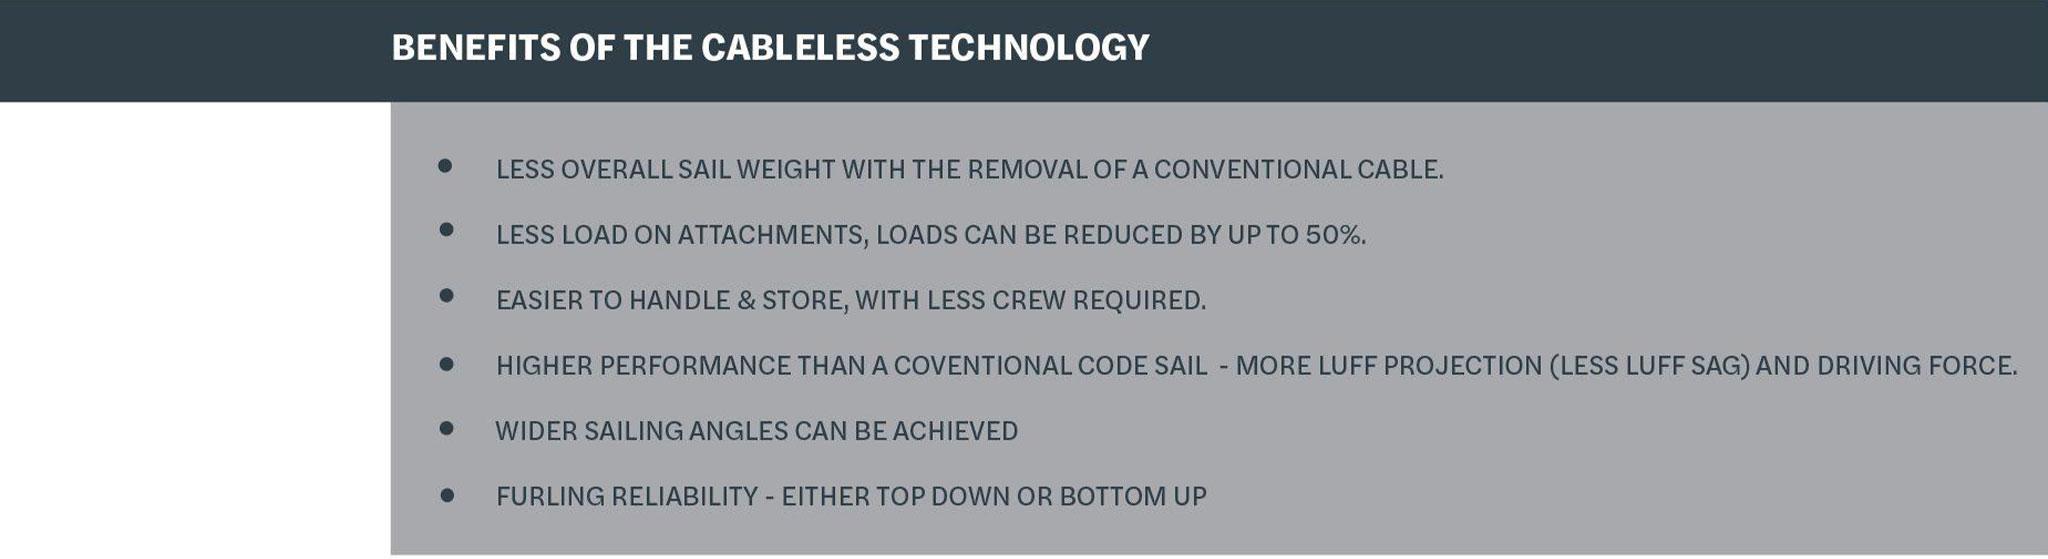 CABLELESS TECHNOLOGY